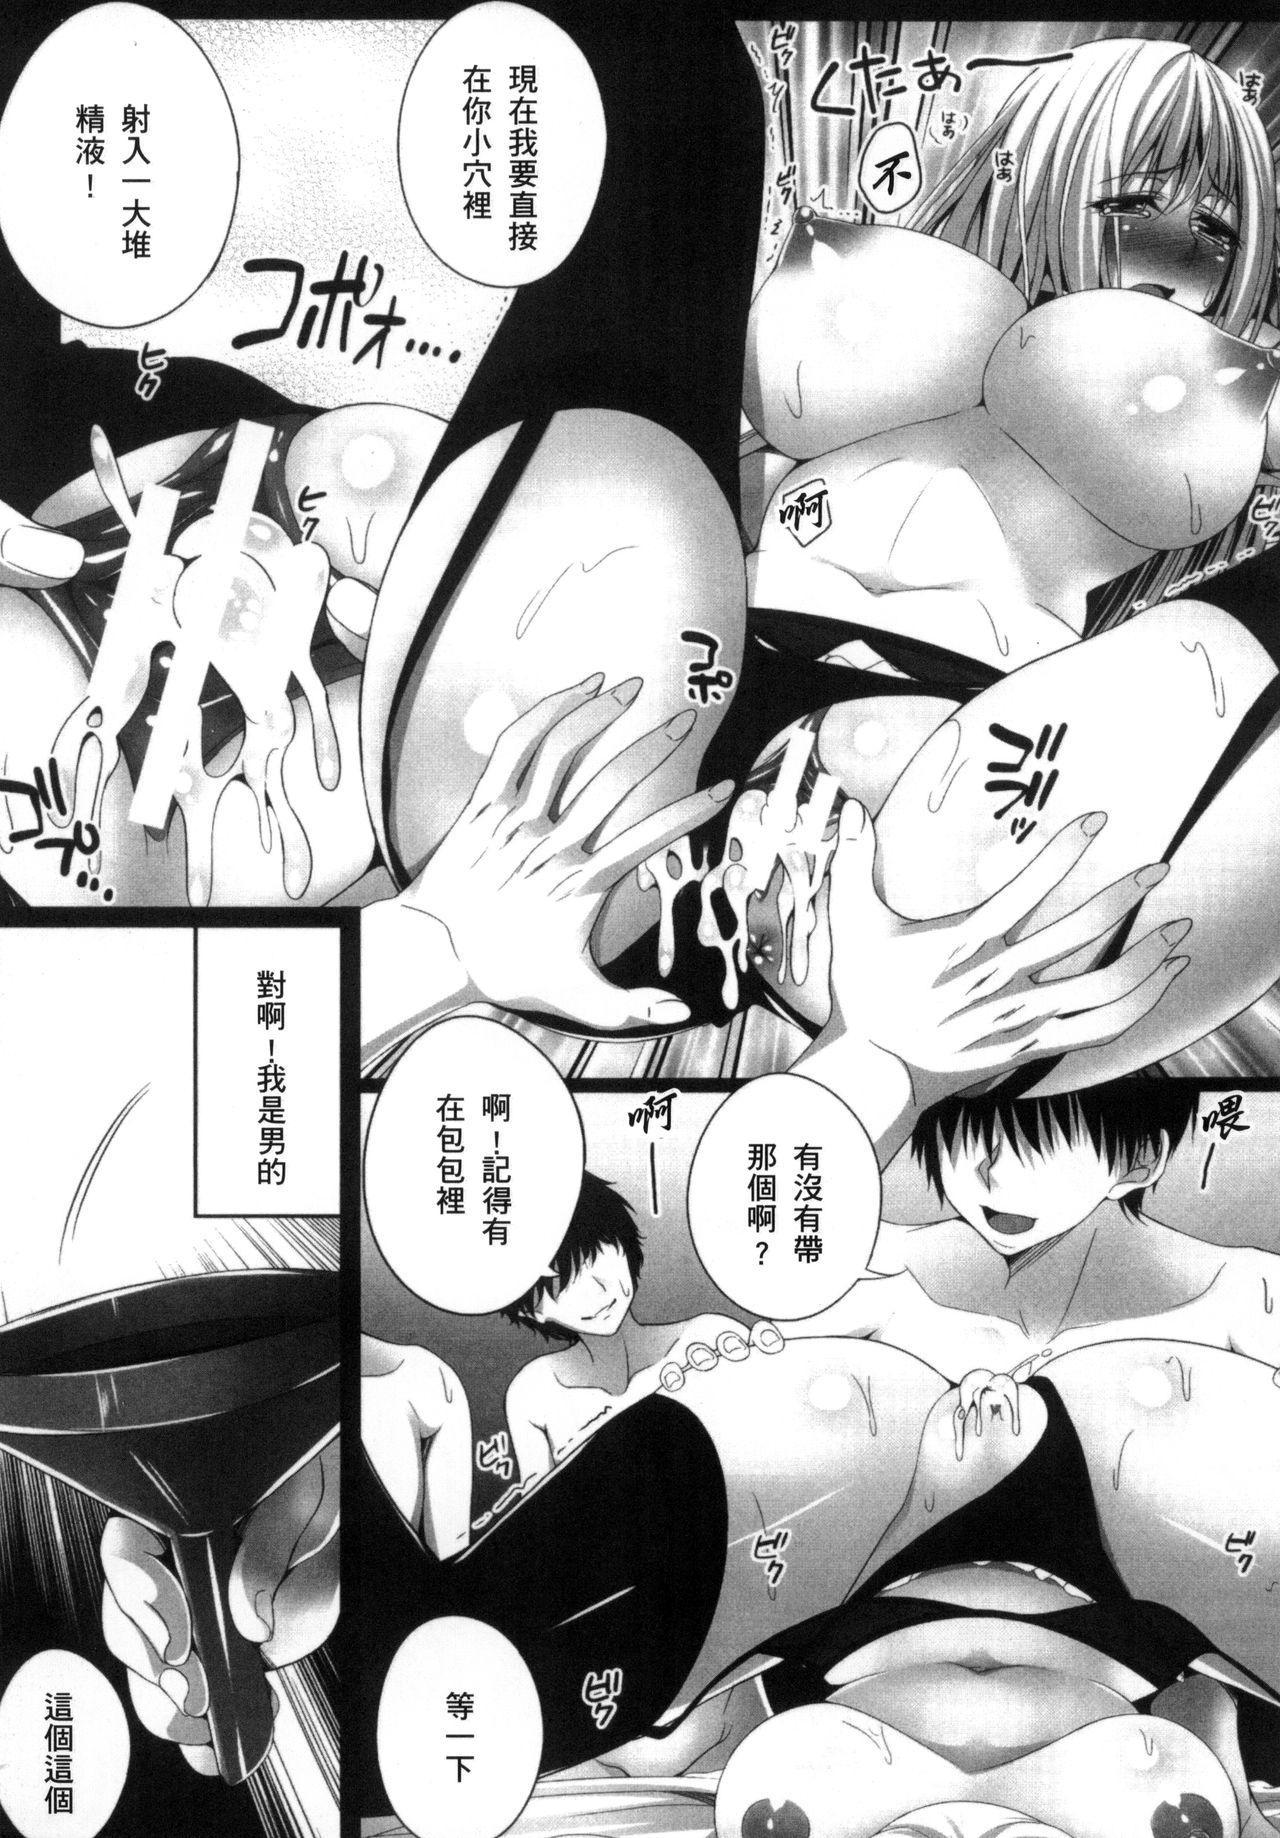 2D Comic Magazine Seitenkan Shite Haramasarete Botebara End! | 性轉換與懷孕,滿腹精液收場! 80